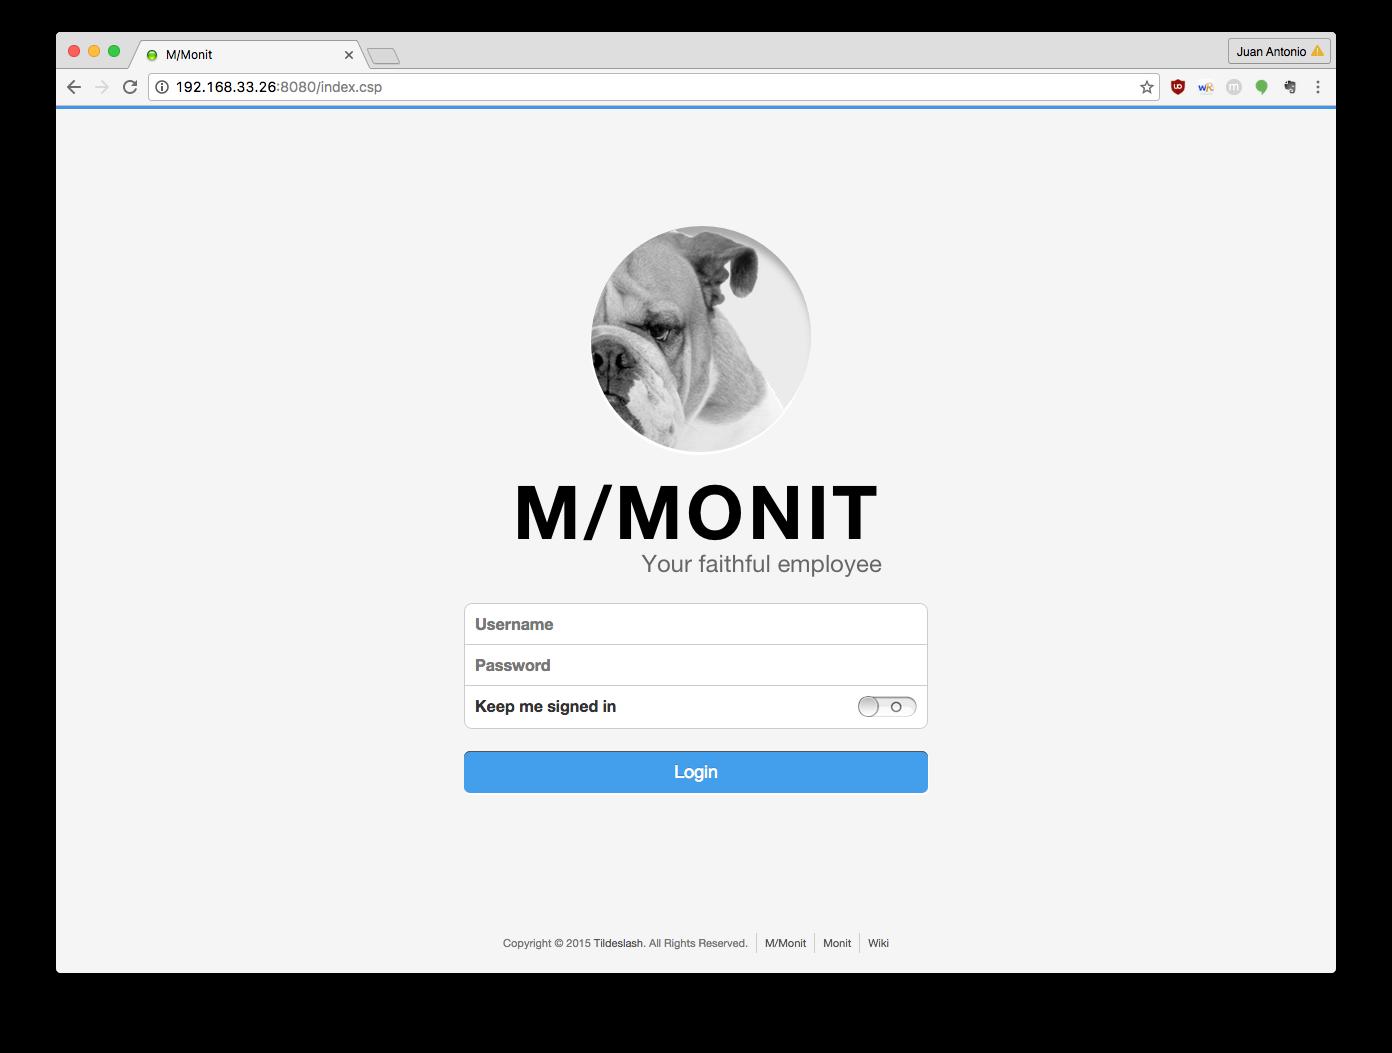 M/Monit login page